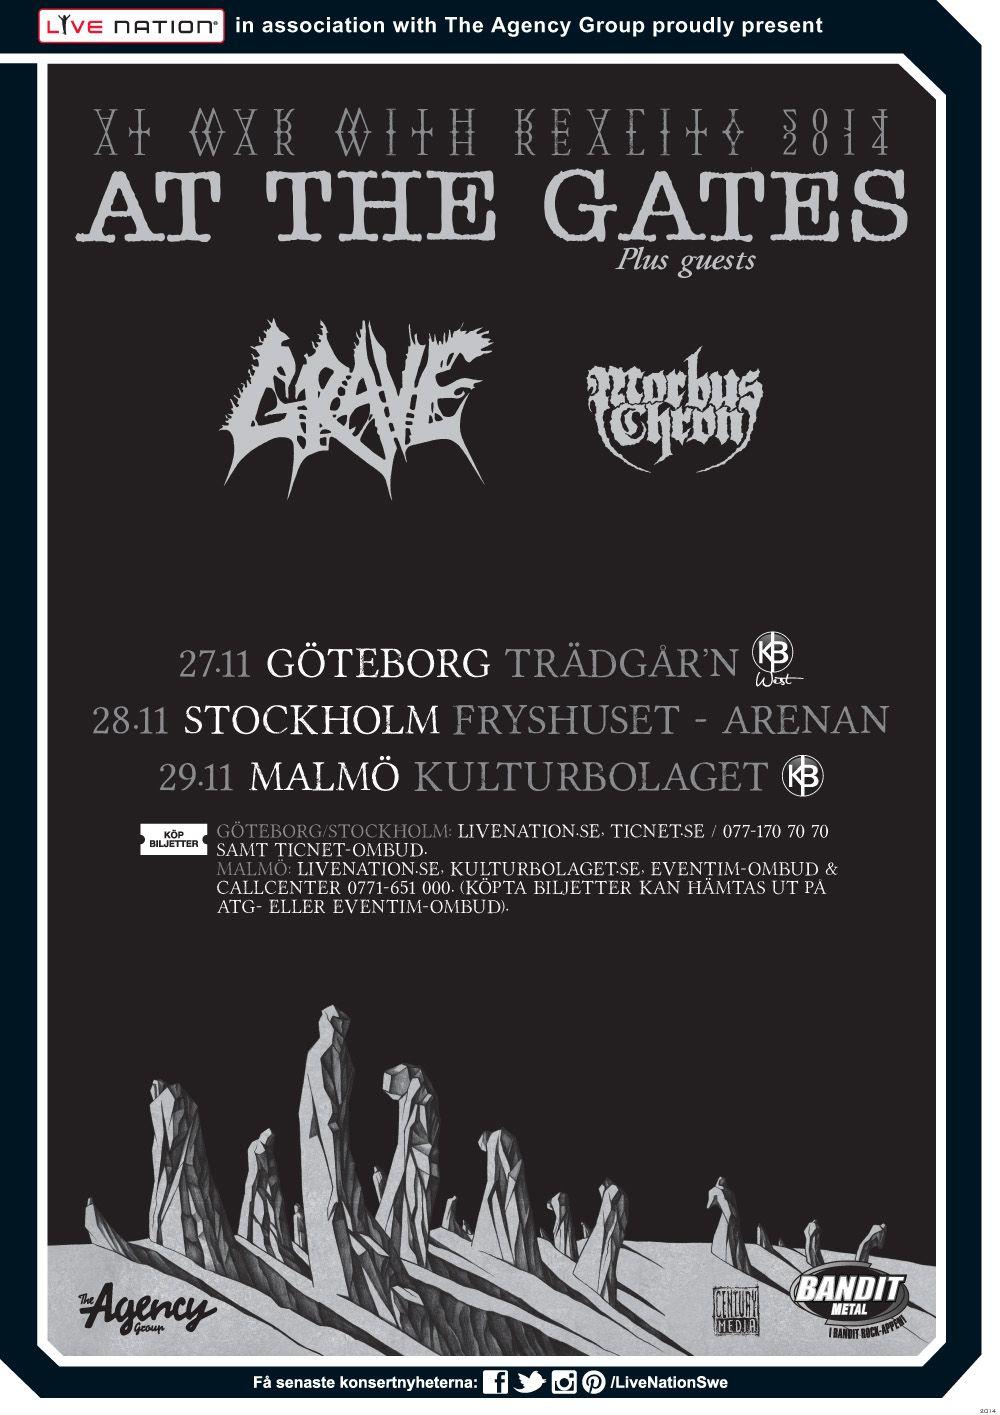 AT THE GATES | 27/11 Göteborg, Trädgår'n | 28/11 Stockholm, Arenan - Fryshuset | 29/11 Malmö, KB | #AtTheGates #Grave #MorbusChron #artwork